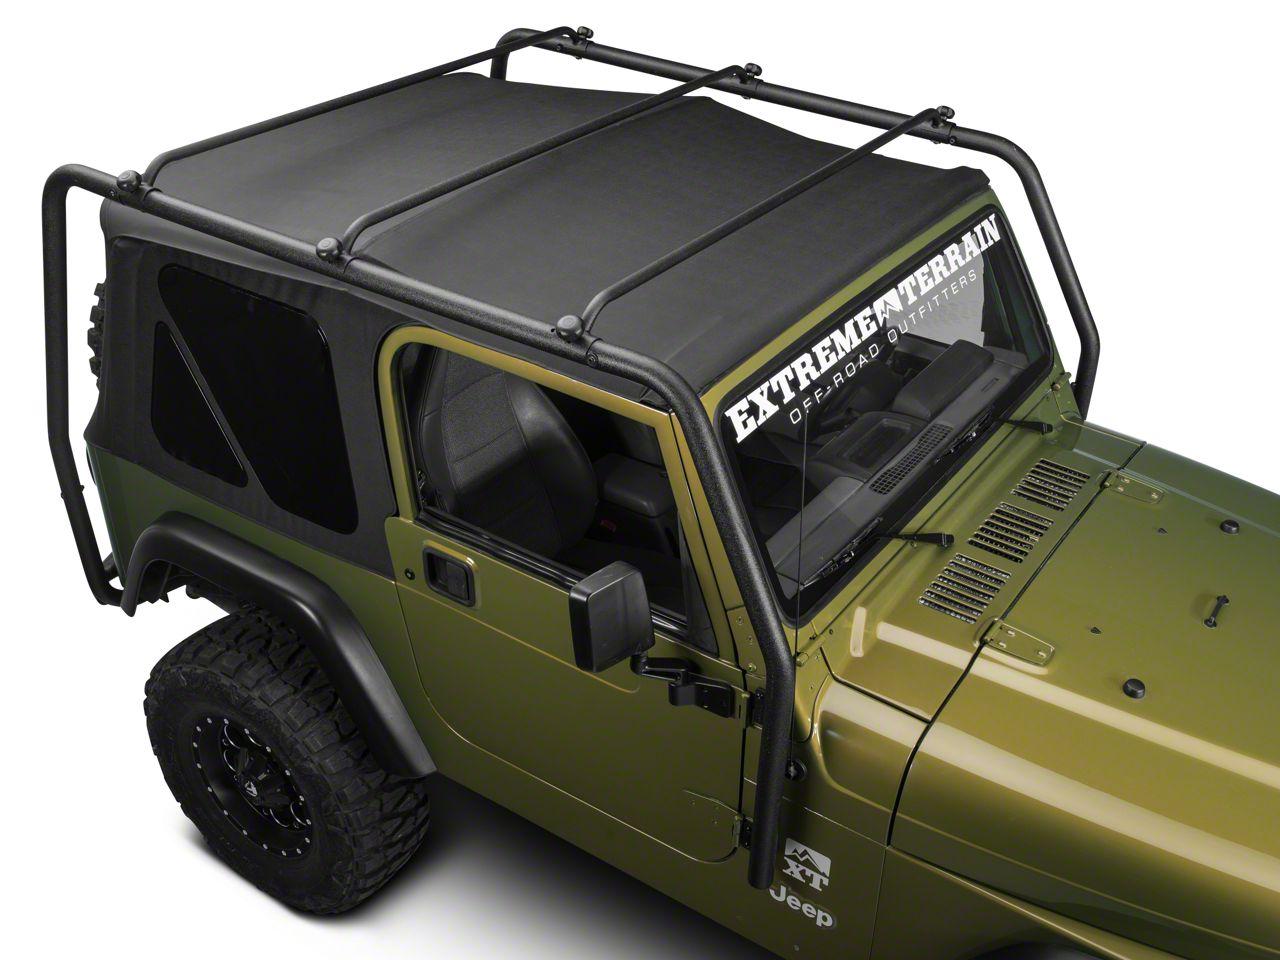 Barricade Jeep Wrangler Roof Rack Textured Black J100172 97 06 Jeep Wrangler Tj Excluding Unlimited